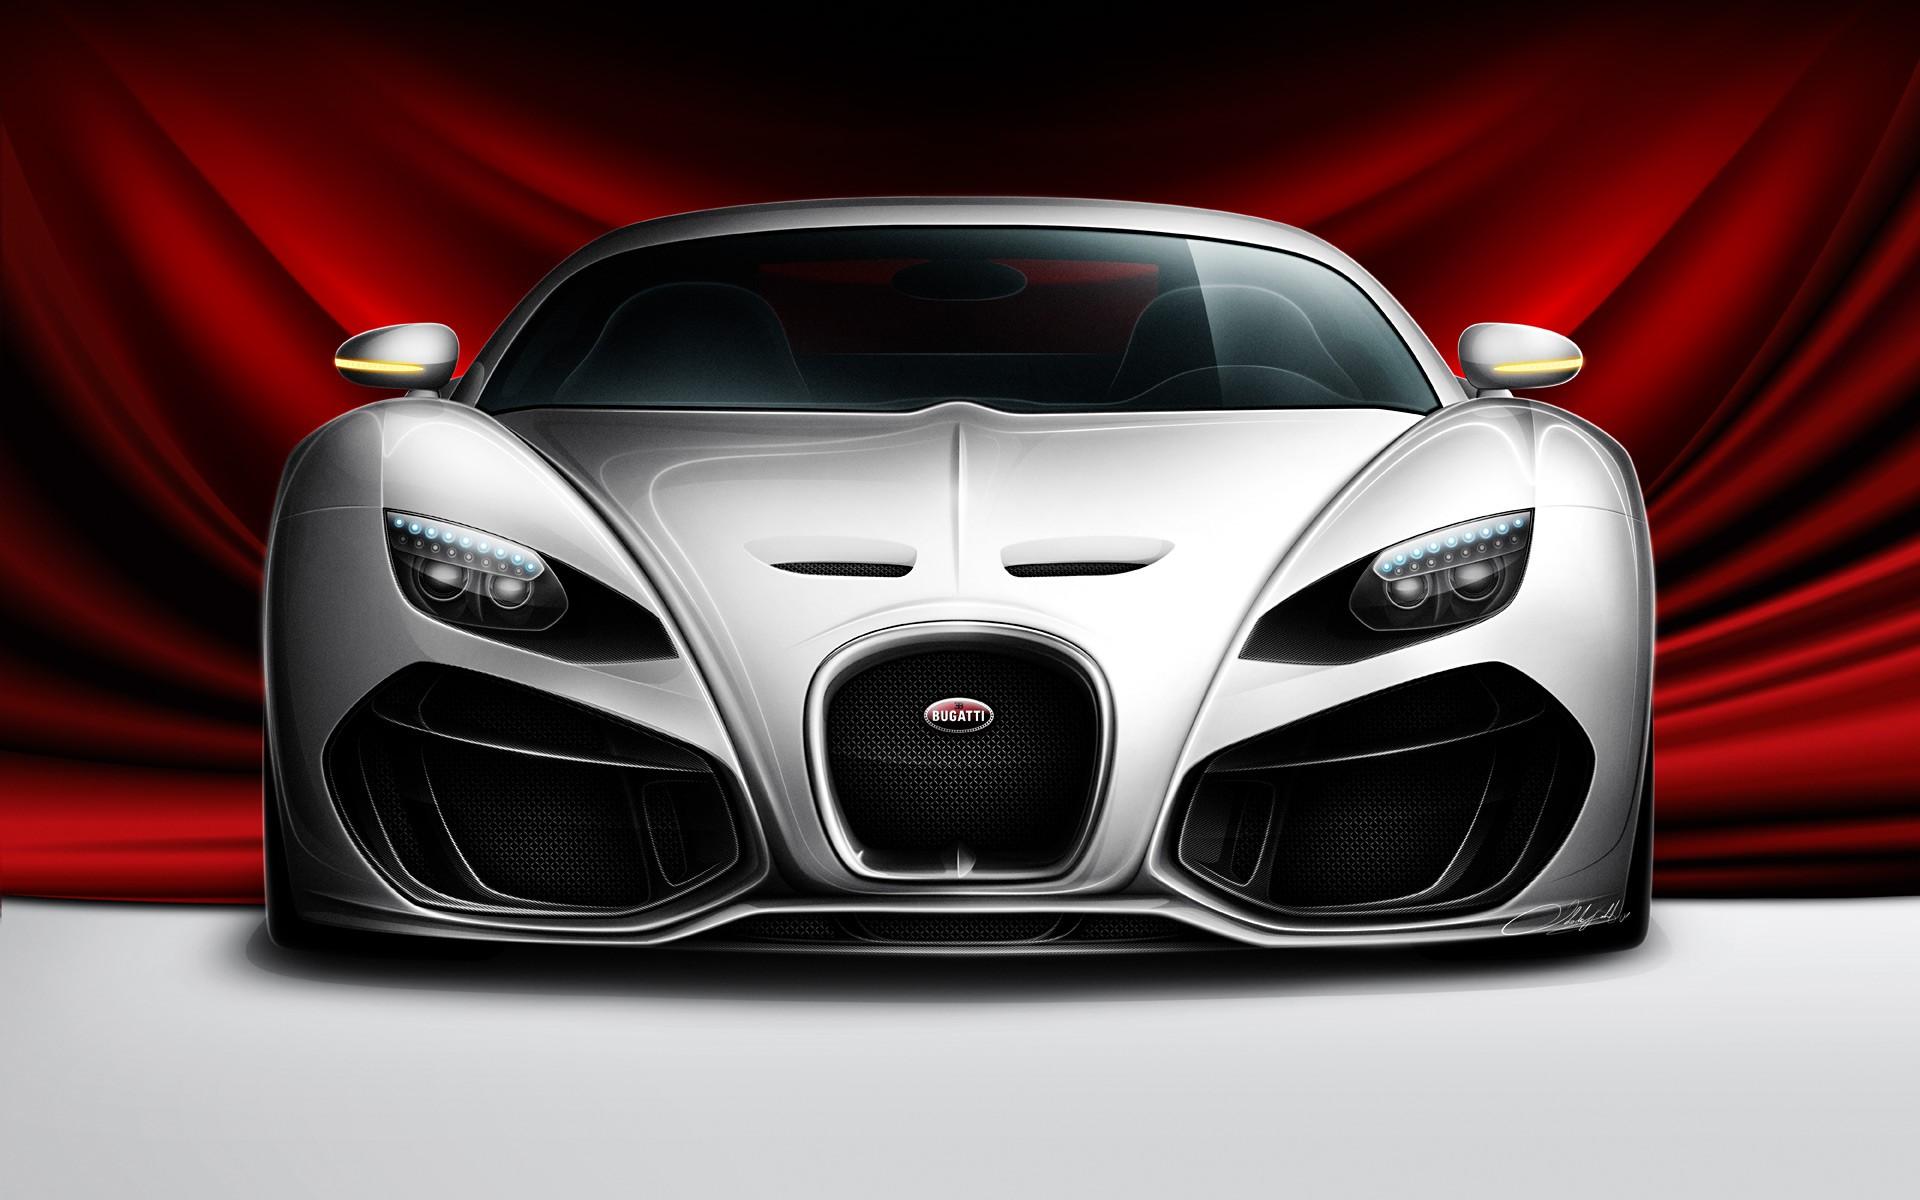 2016-Bugatti-Veyron-front-grill